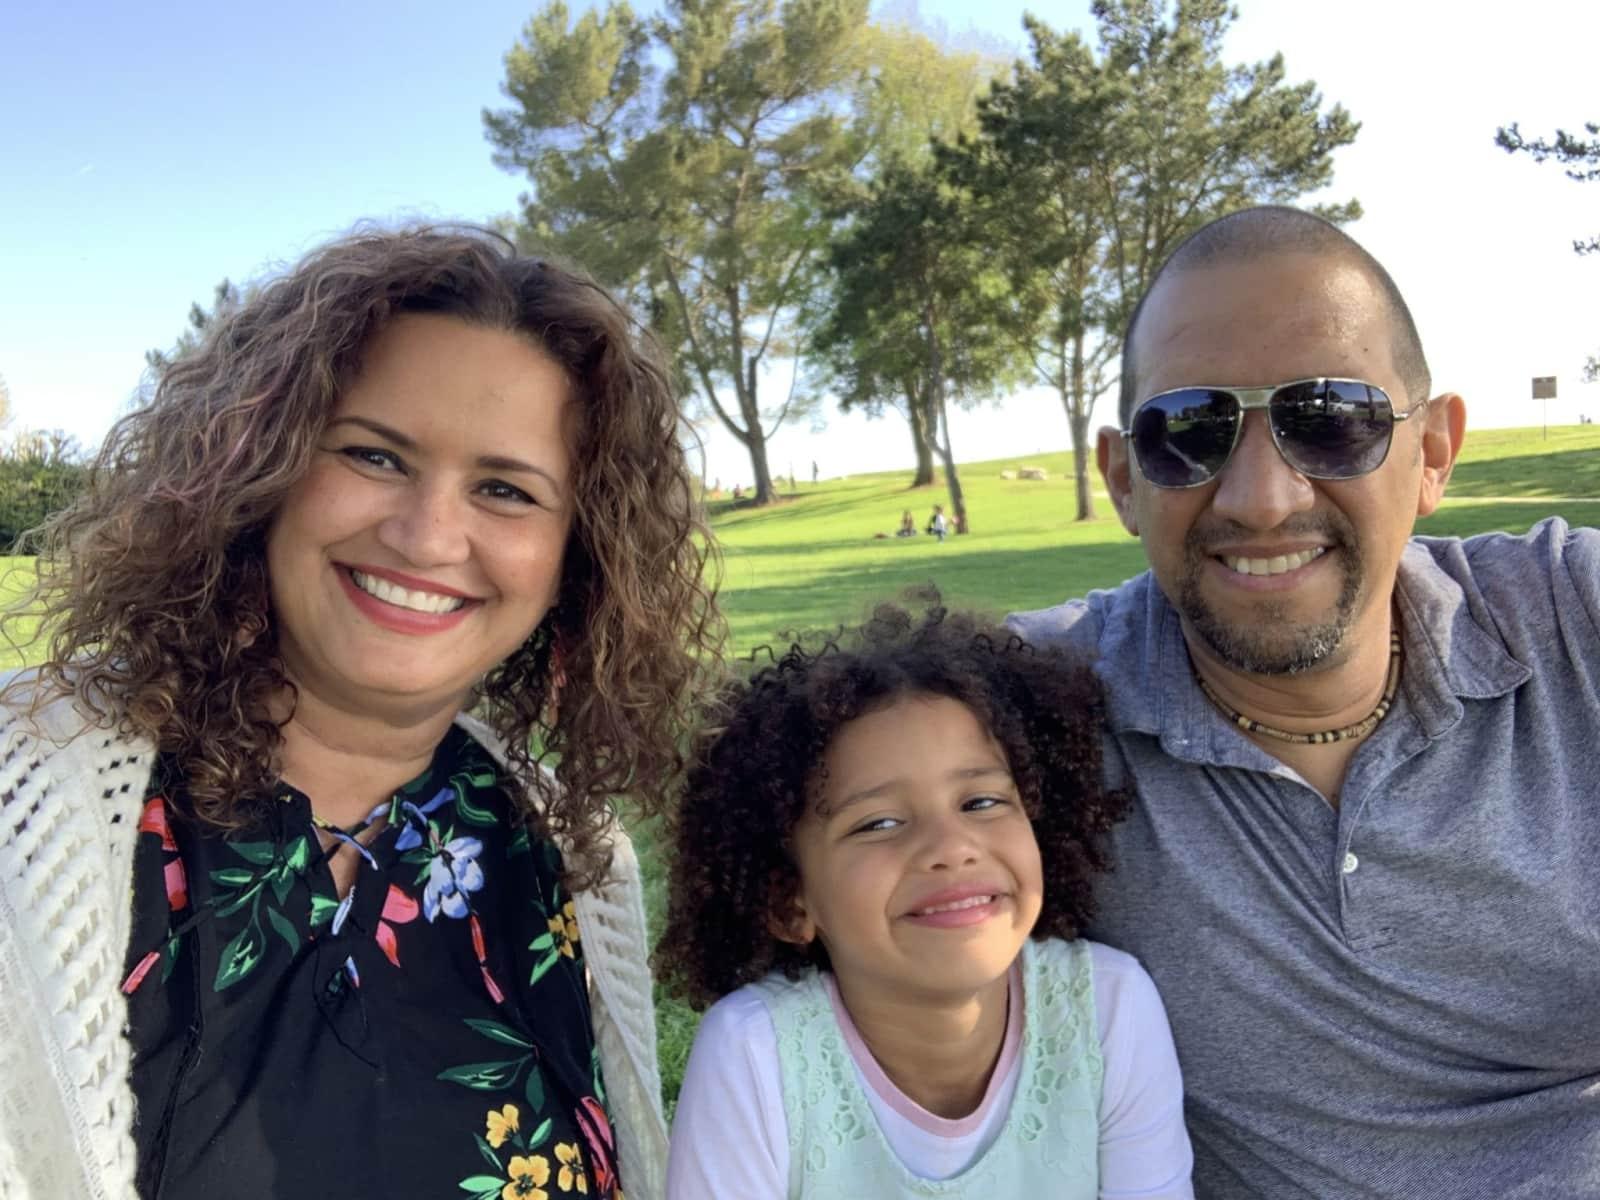 Blanca, randal & vicky & Randal from Playa del Rey, California, United States